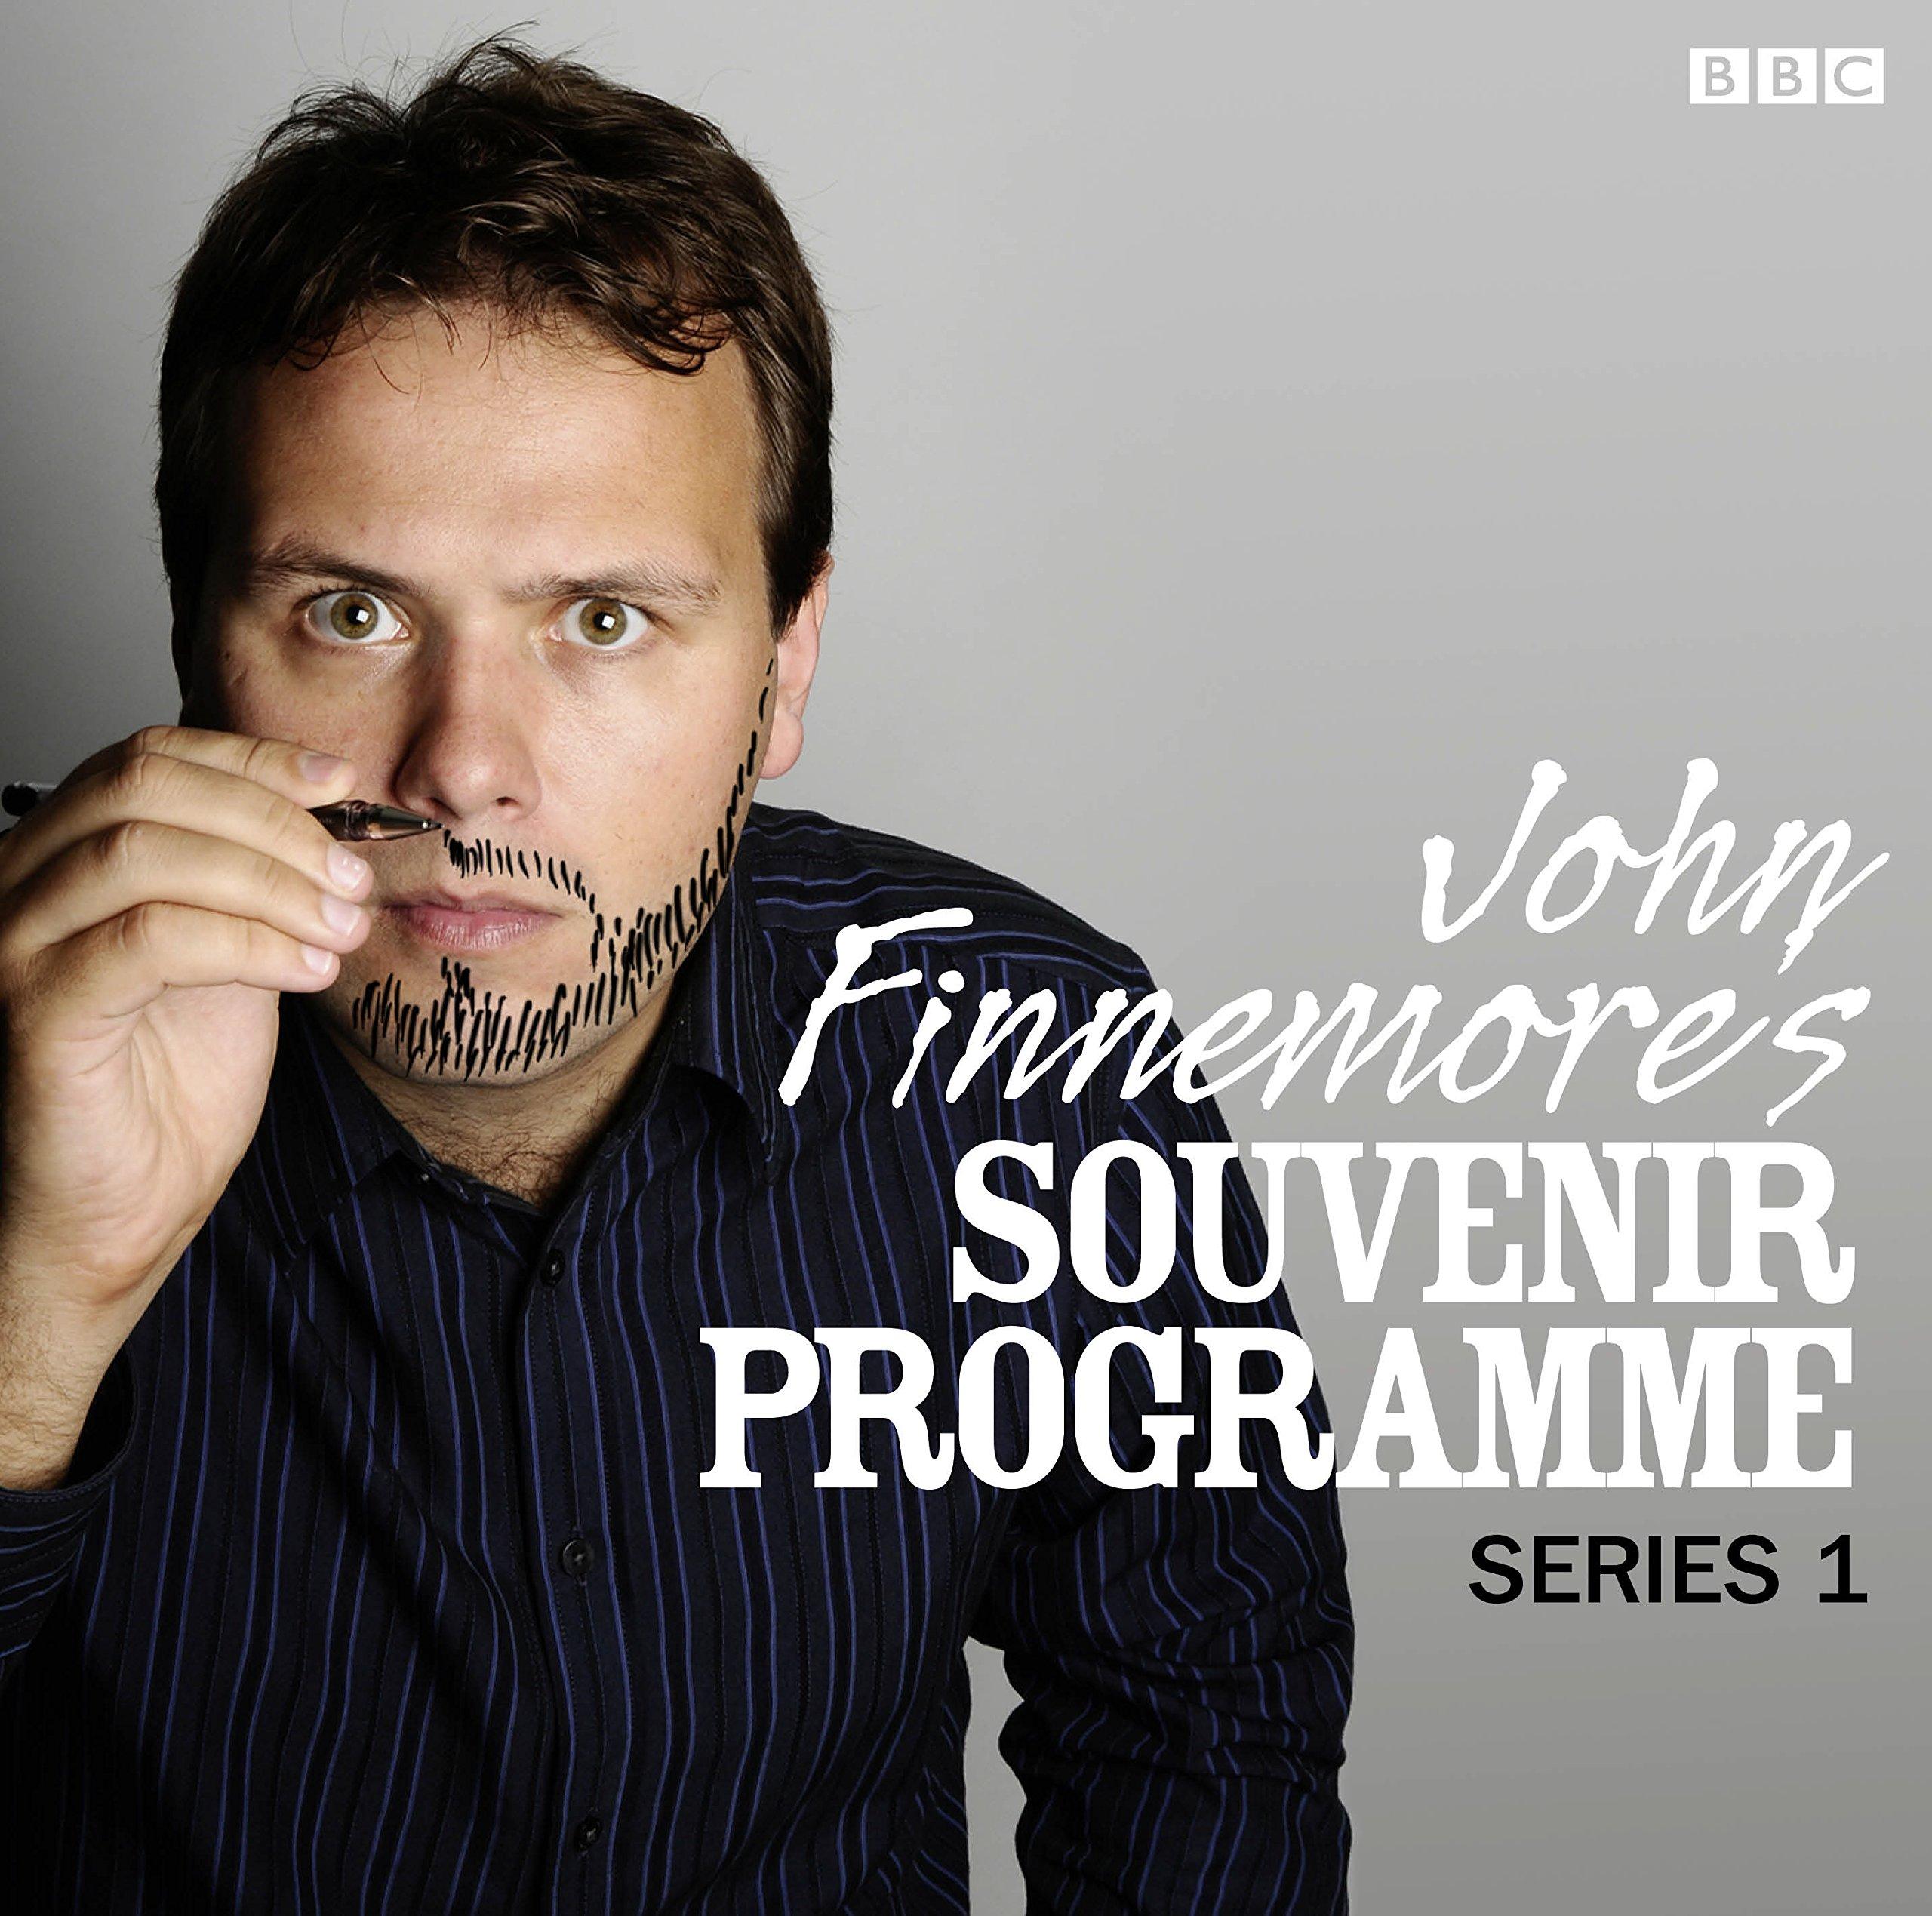 john finnemores souvenir programme series 4